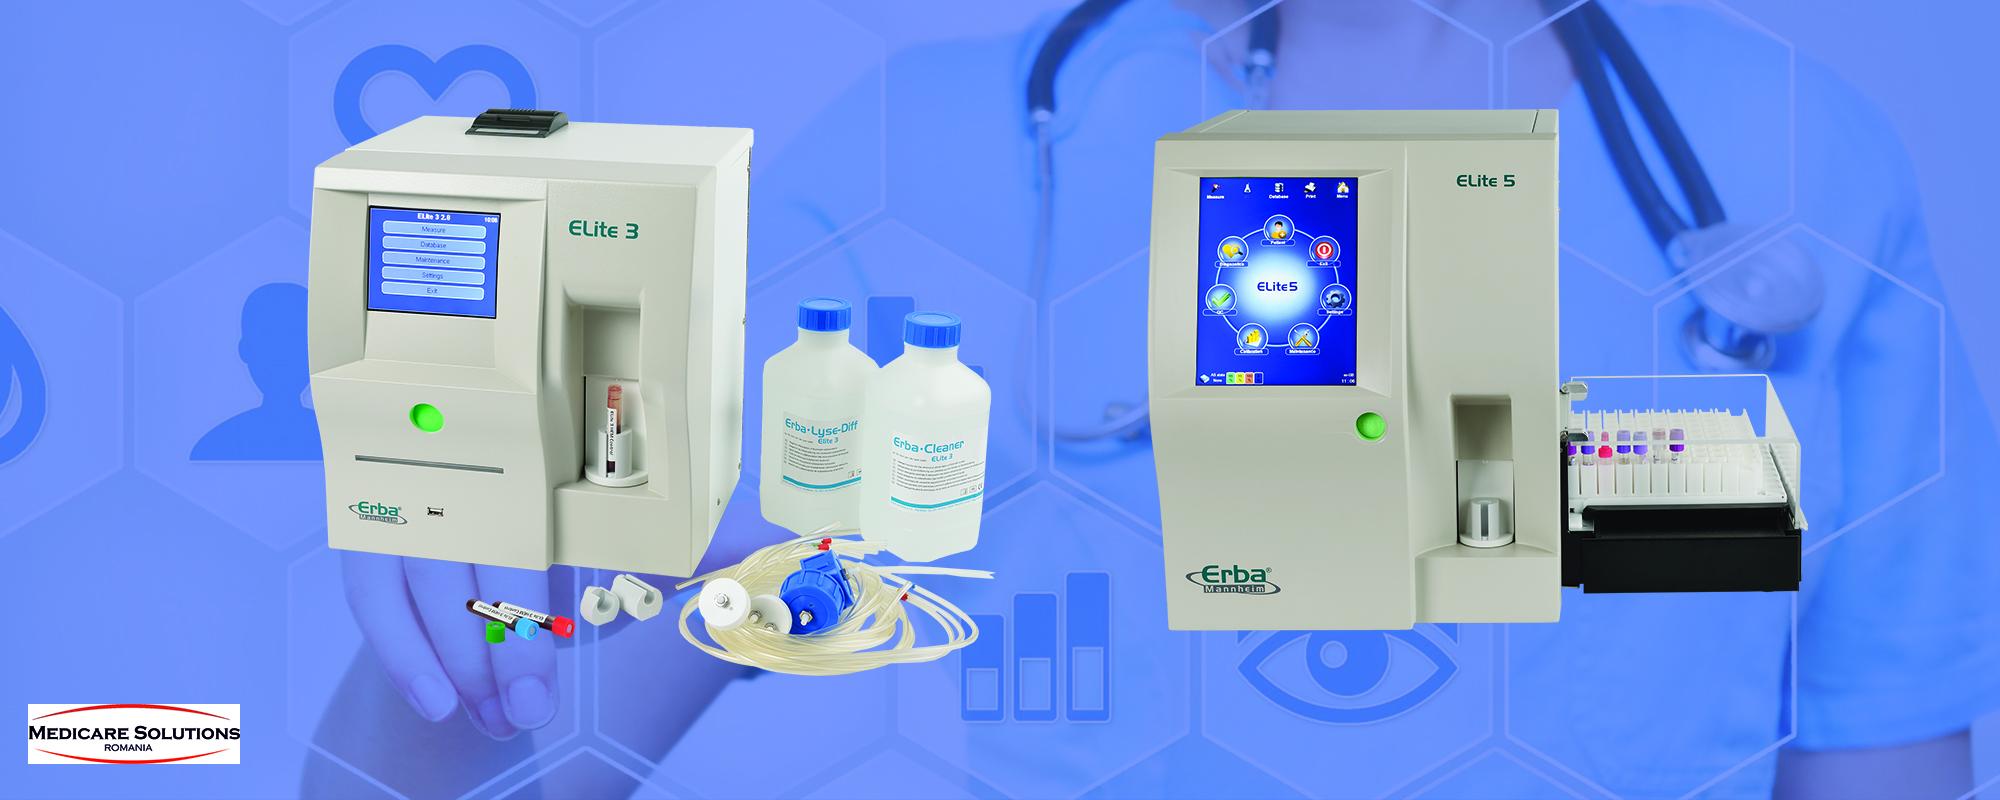 Analizator automat de hematologie Elite 3 & Elite 5